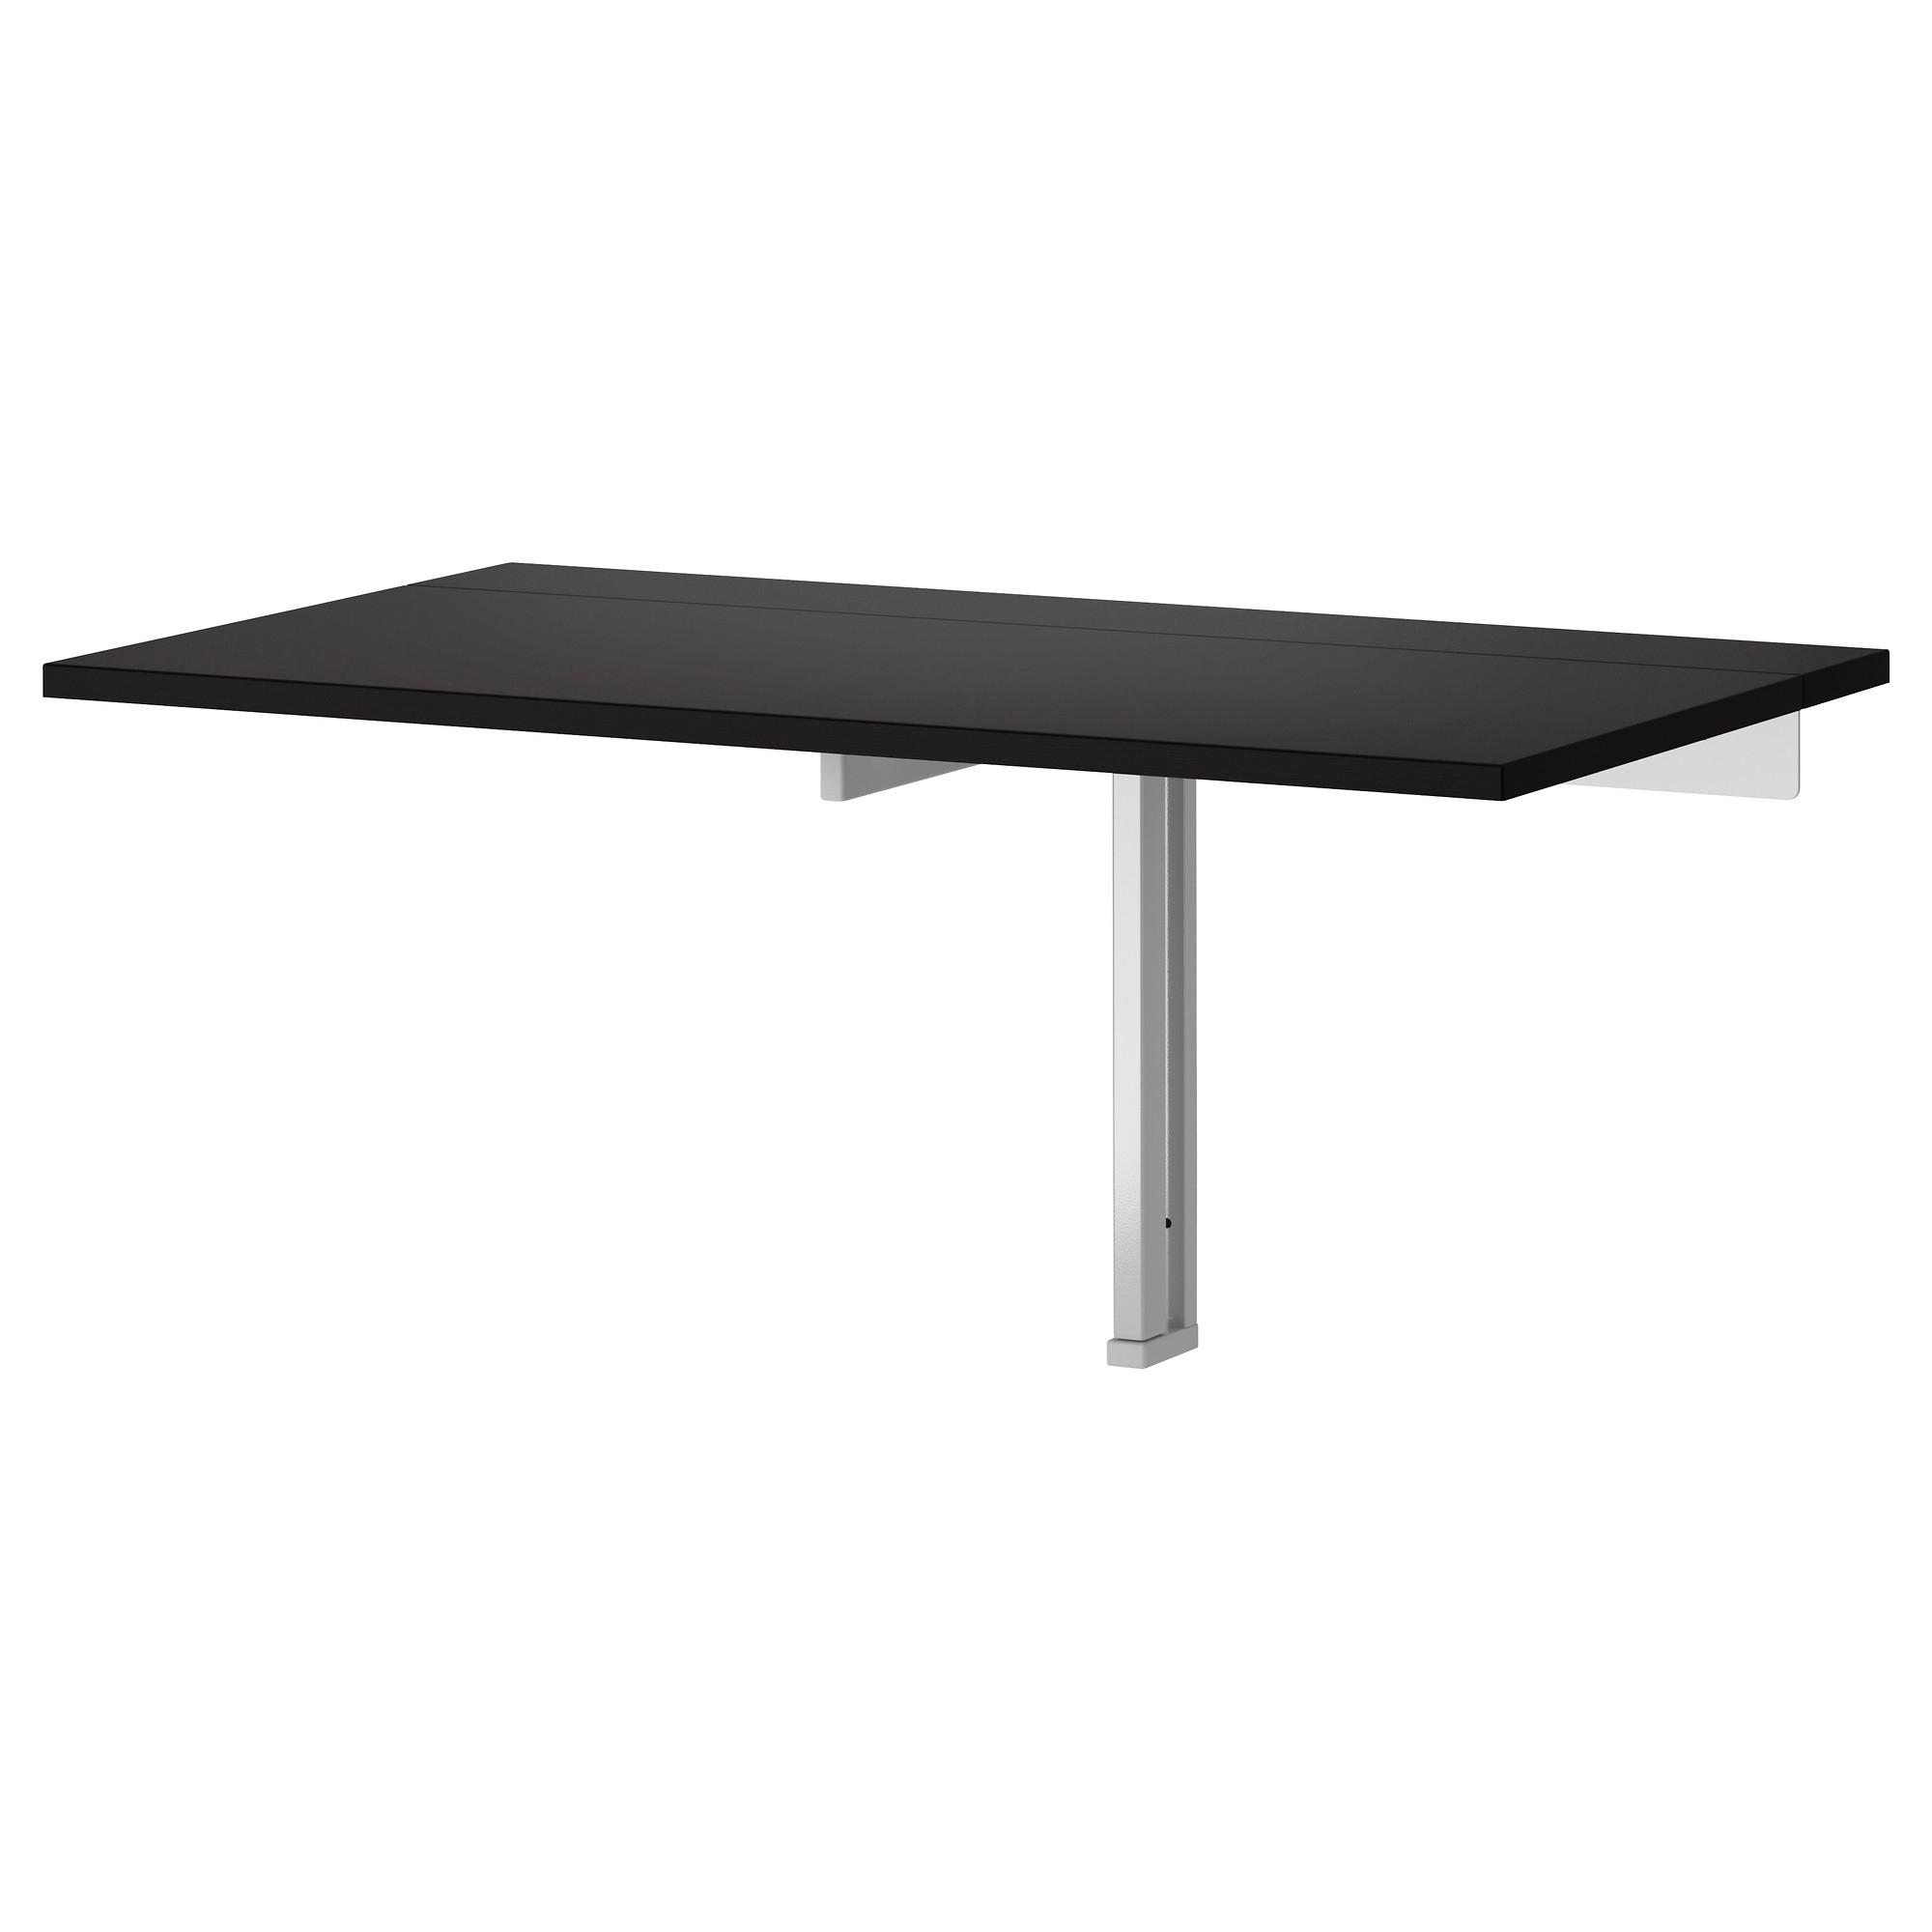 Ikea Mesas Abatibles Hausedekorationideennet Mesa Plegable ...